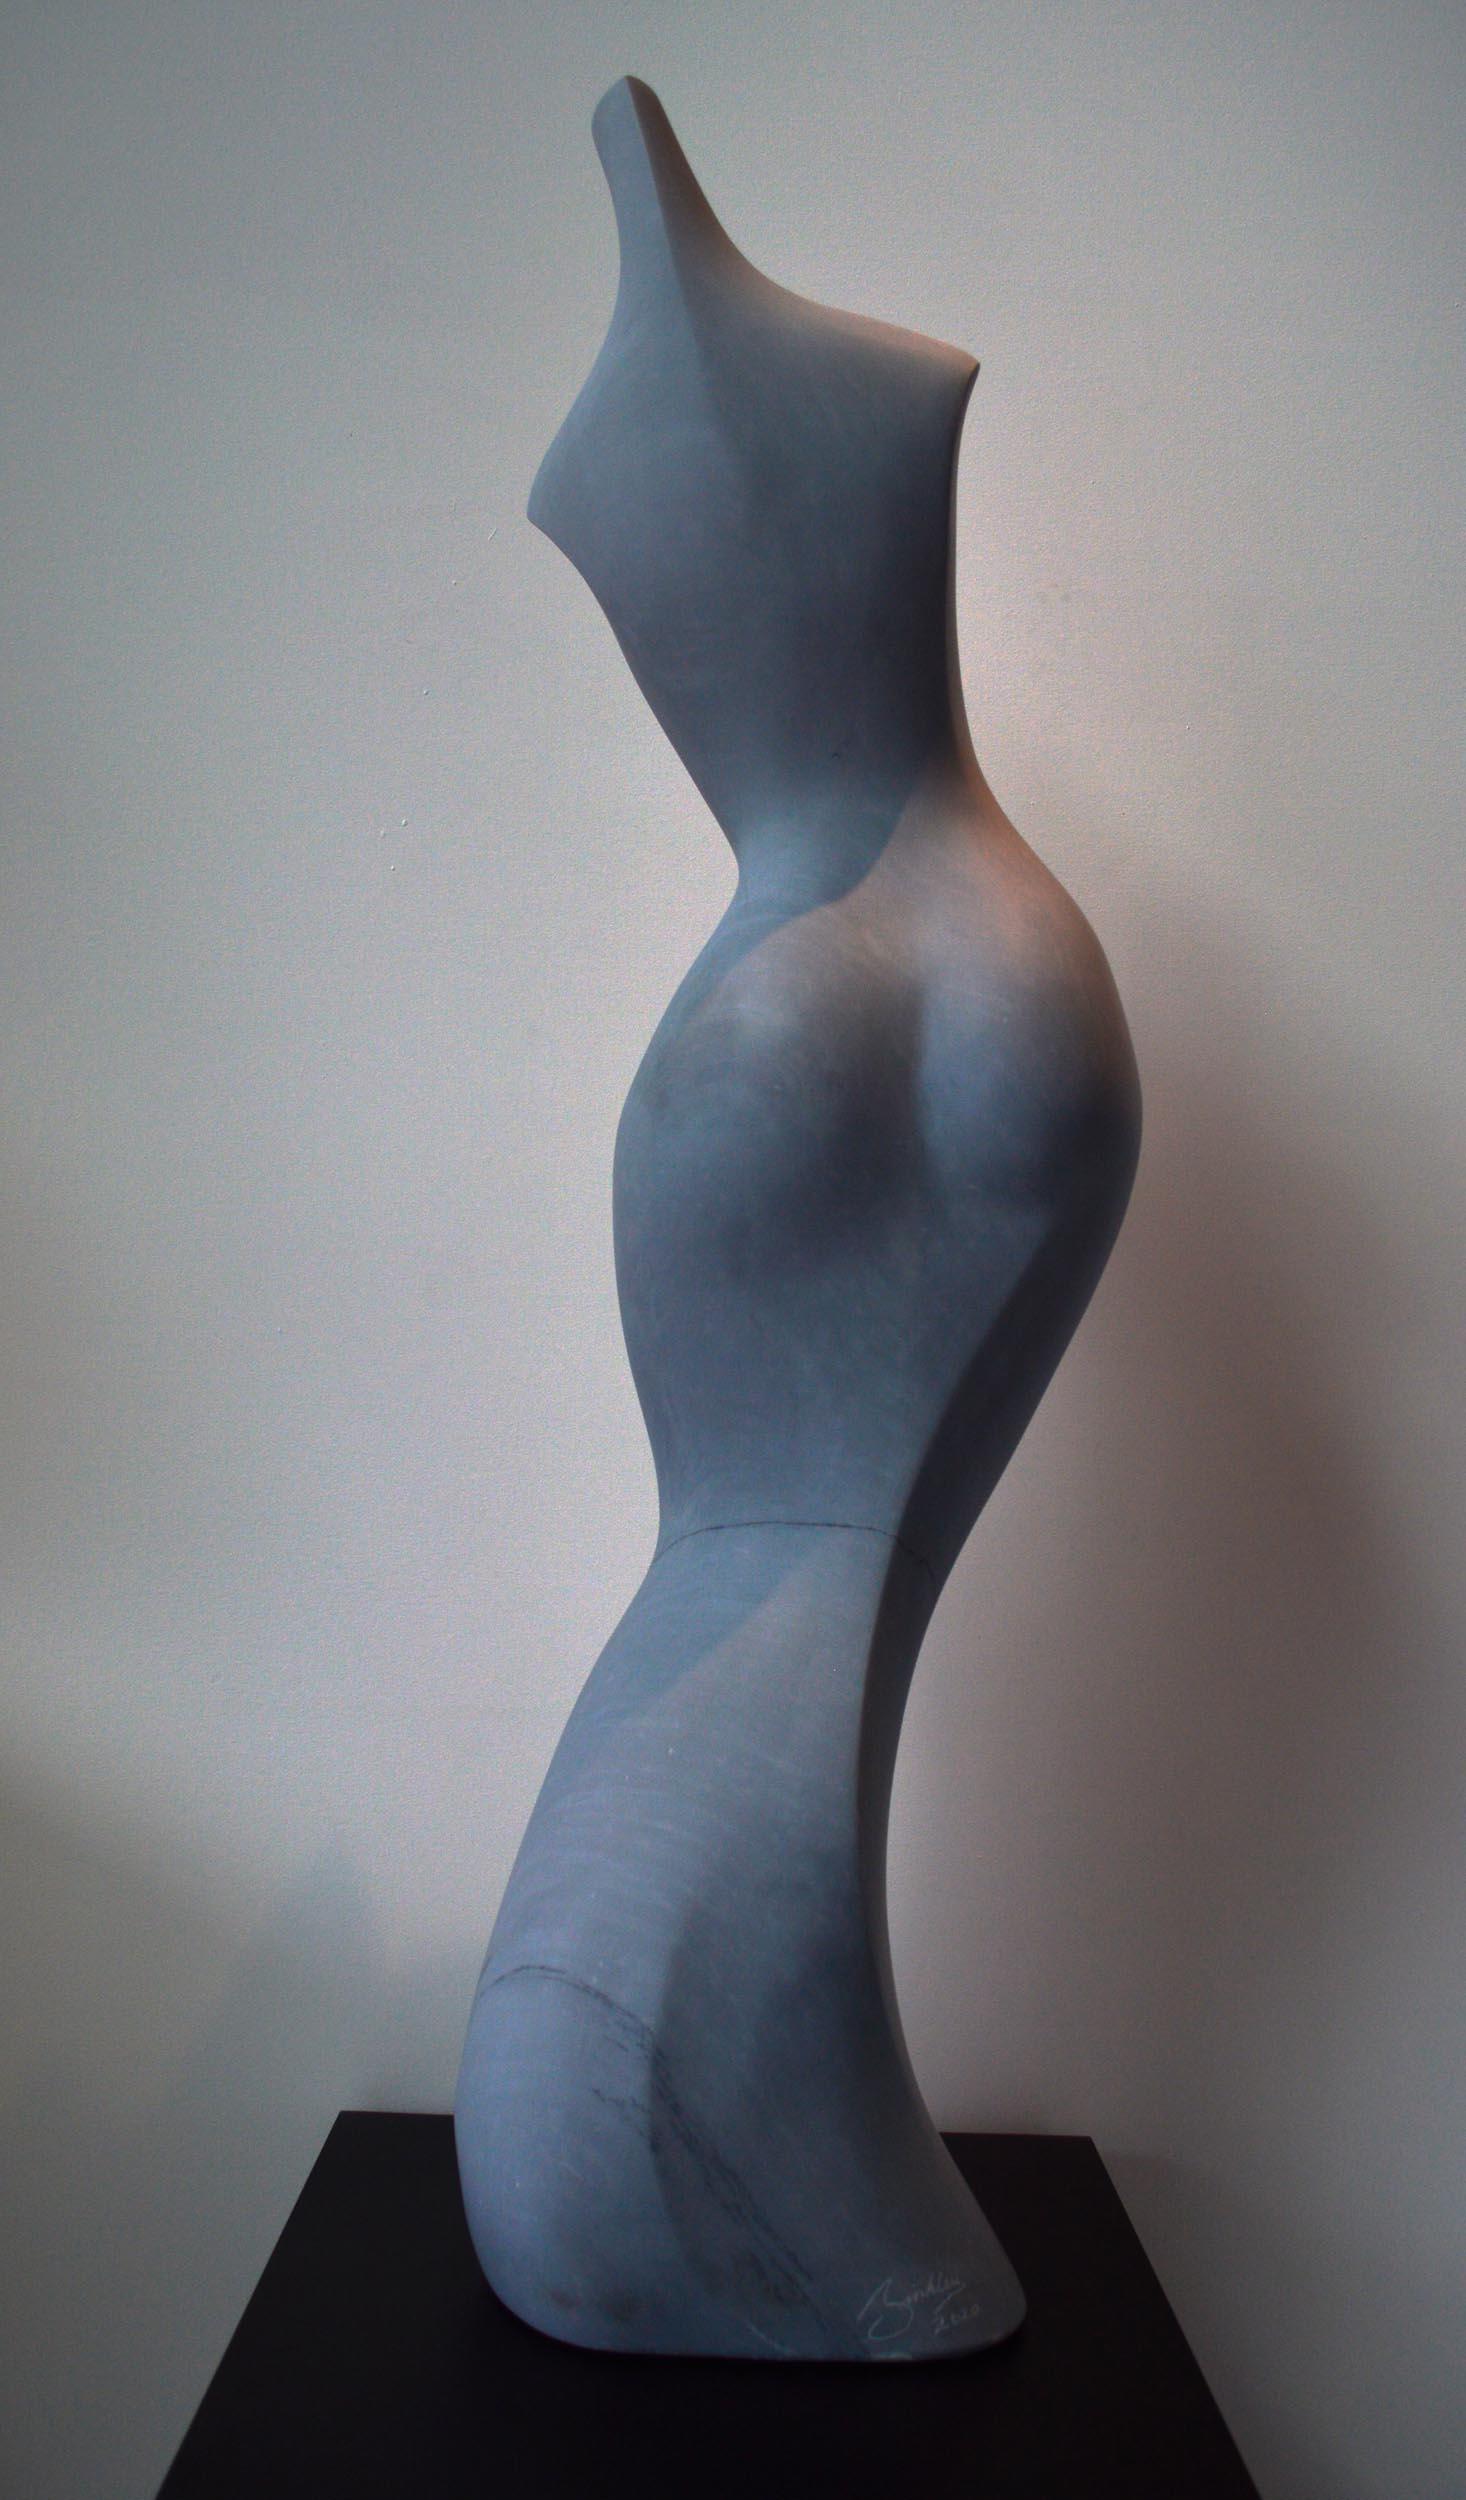 michael binkley sculptor stone sculpture artist female nude marble statue vancouver canada